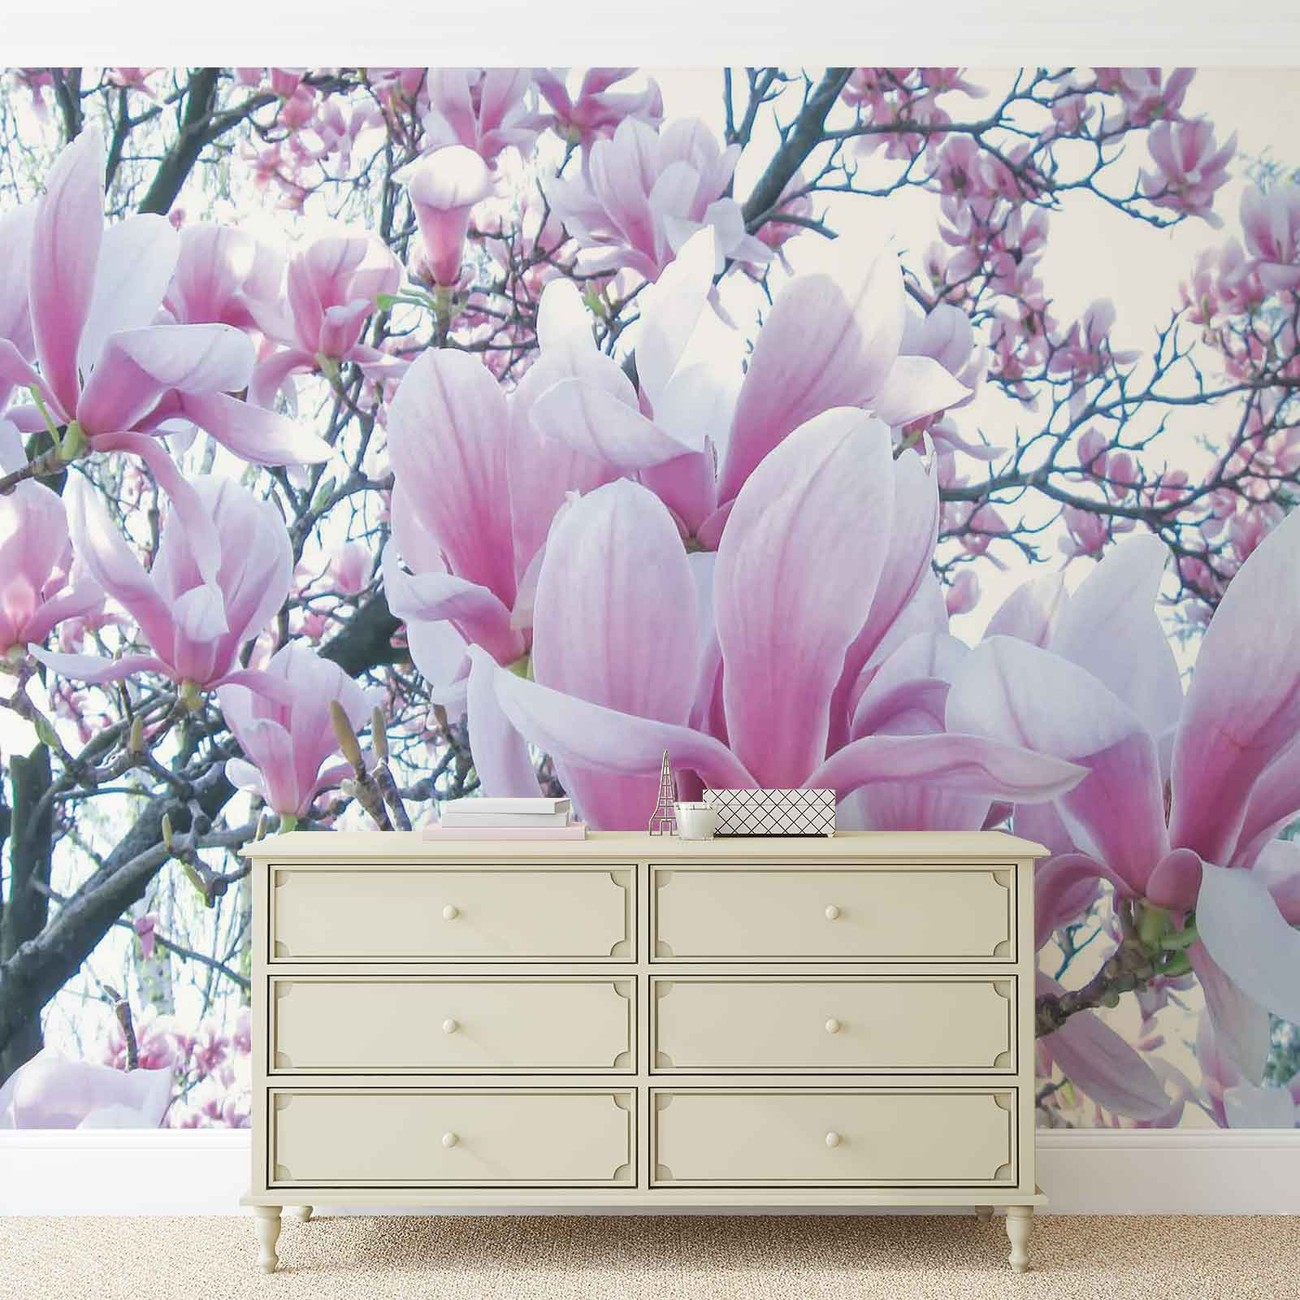 Carta da parati fiori di magnolia for Carta da parati fiori grandi